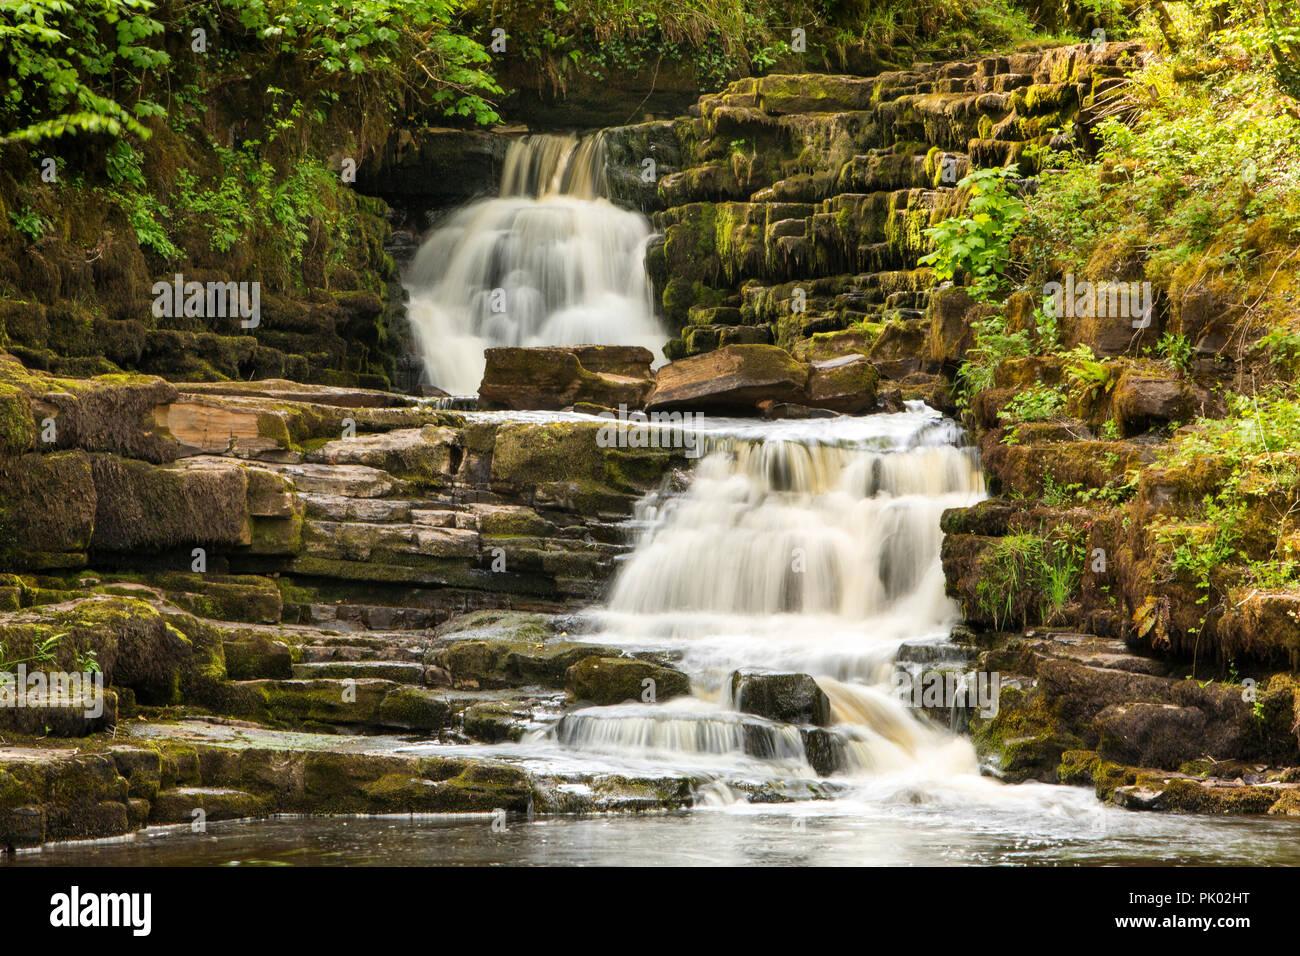 Ireland, Co Leitrim Ballinamore, Aughnasheelin, Corramartin, Poll an Eas waterfall on Yellow River - Stock Image